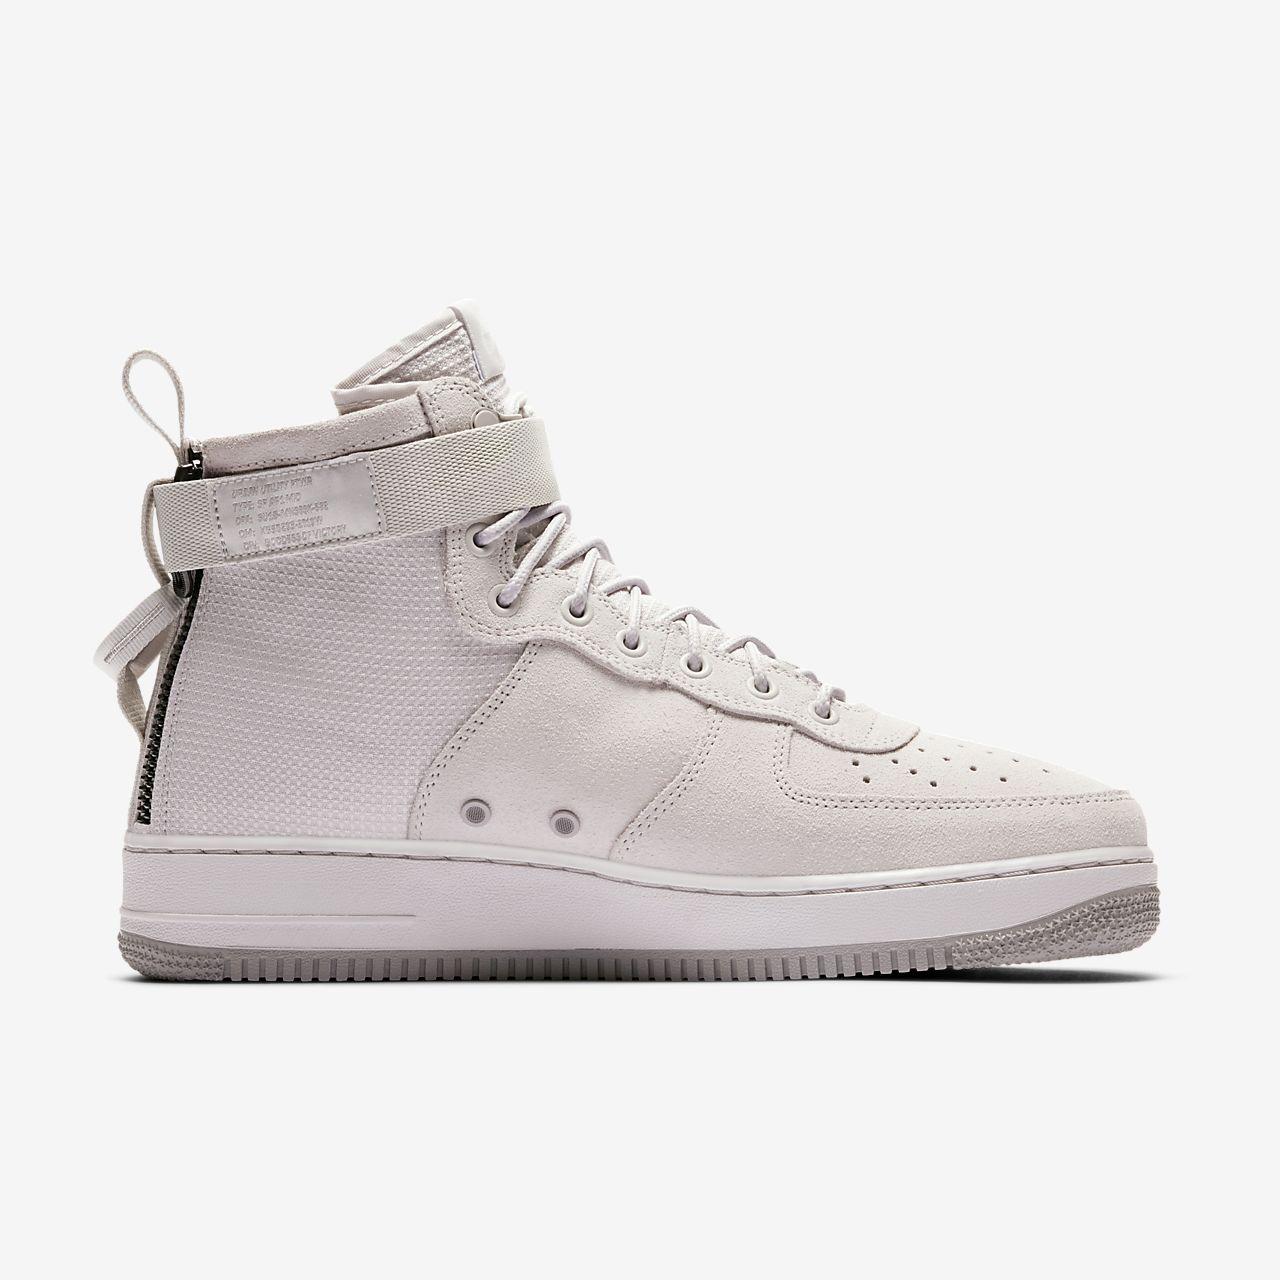 Nike Classic Cortez Suede, Chaussures de Gymnastique Homme, Gris (Atmosphere Grey/Atmosphere Grey 001), 45 EU